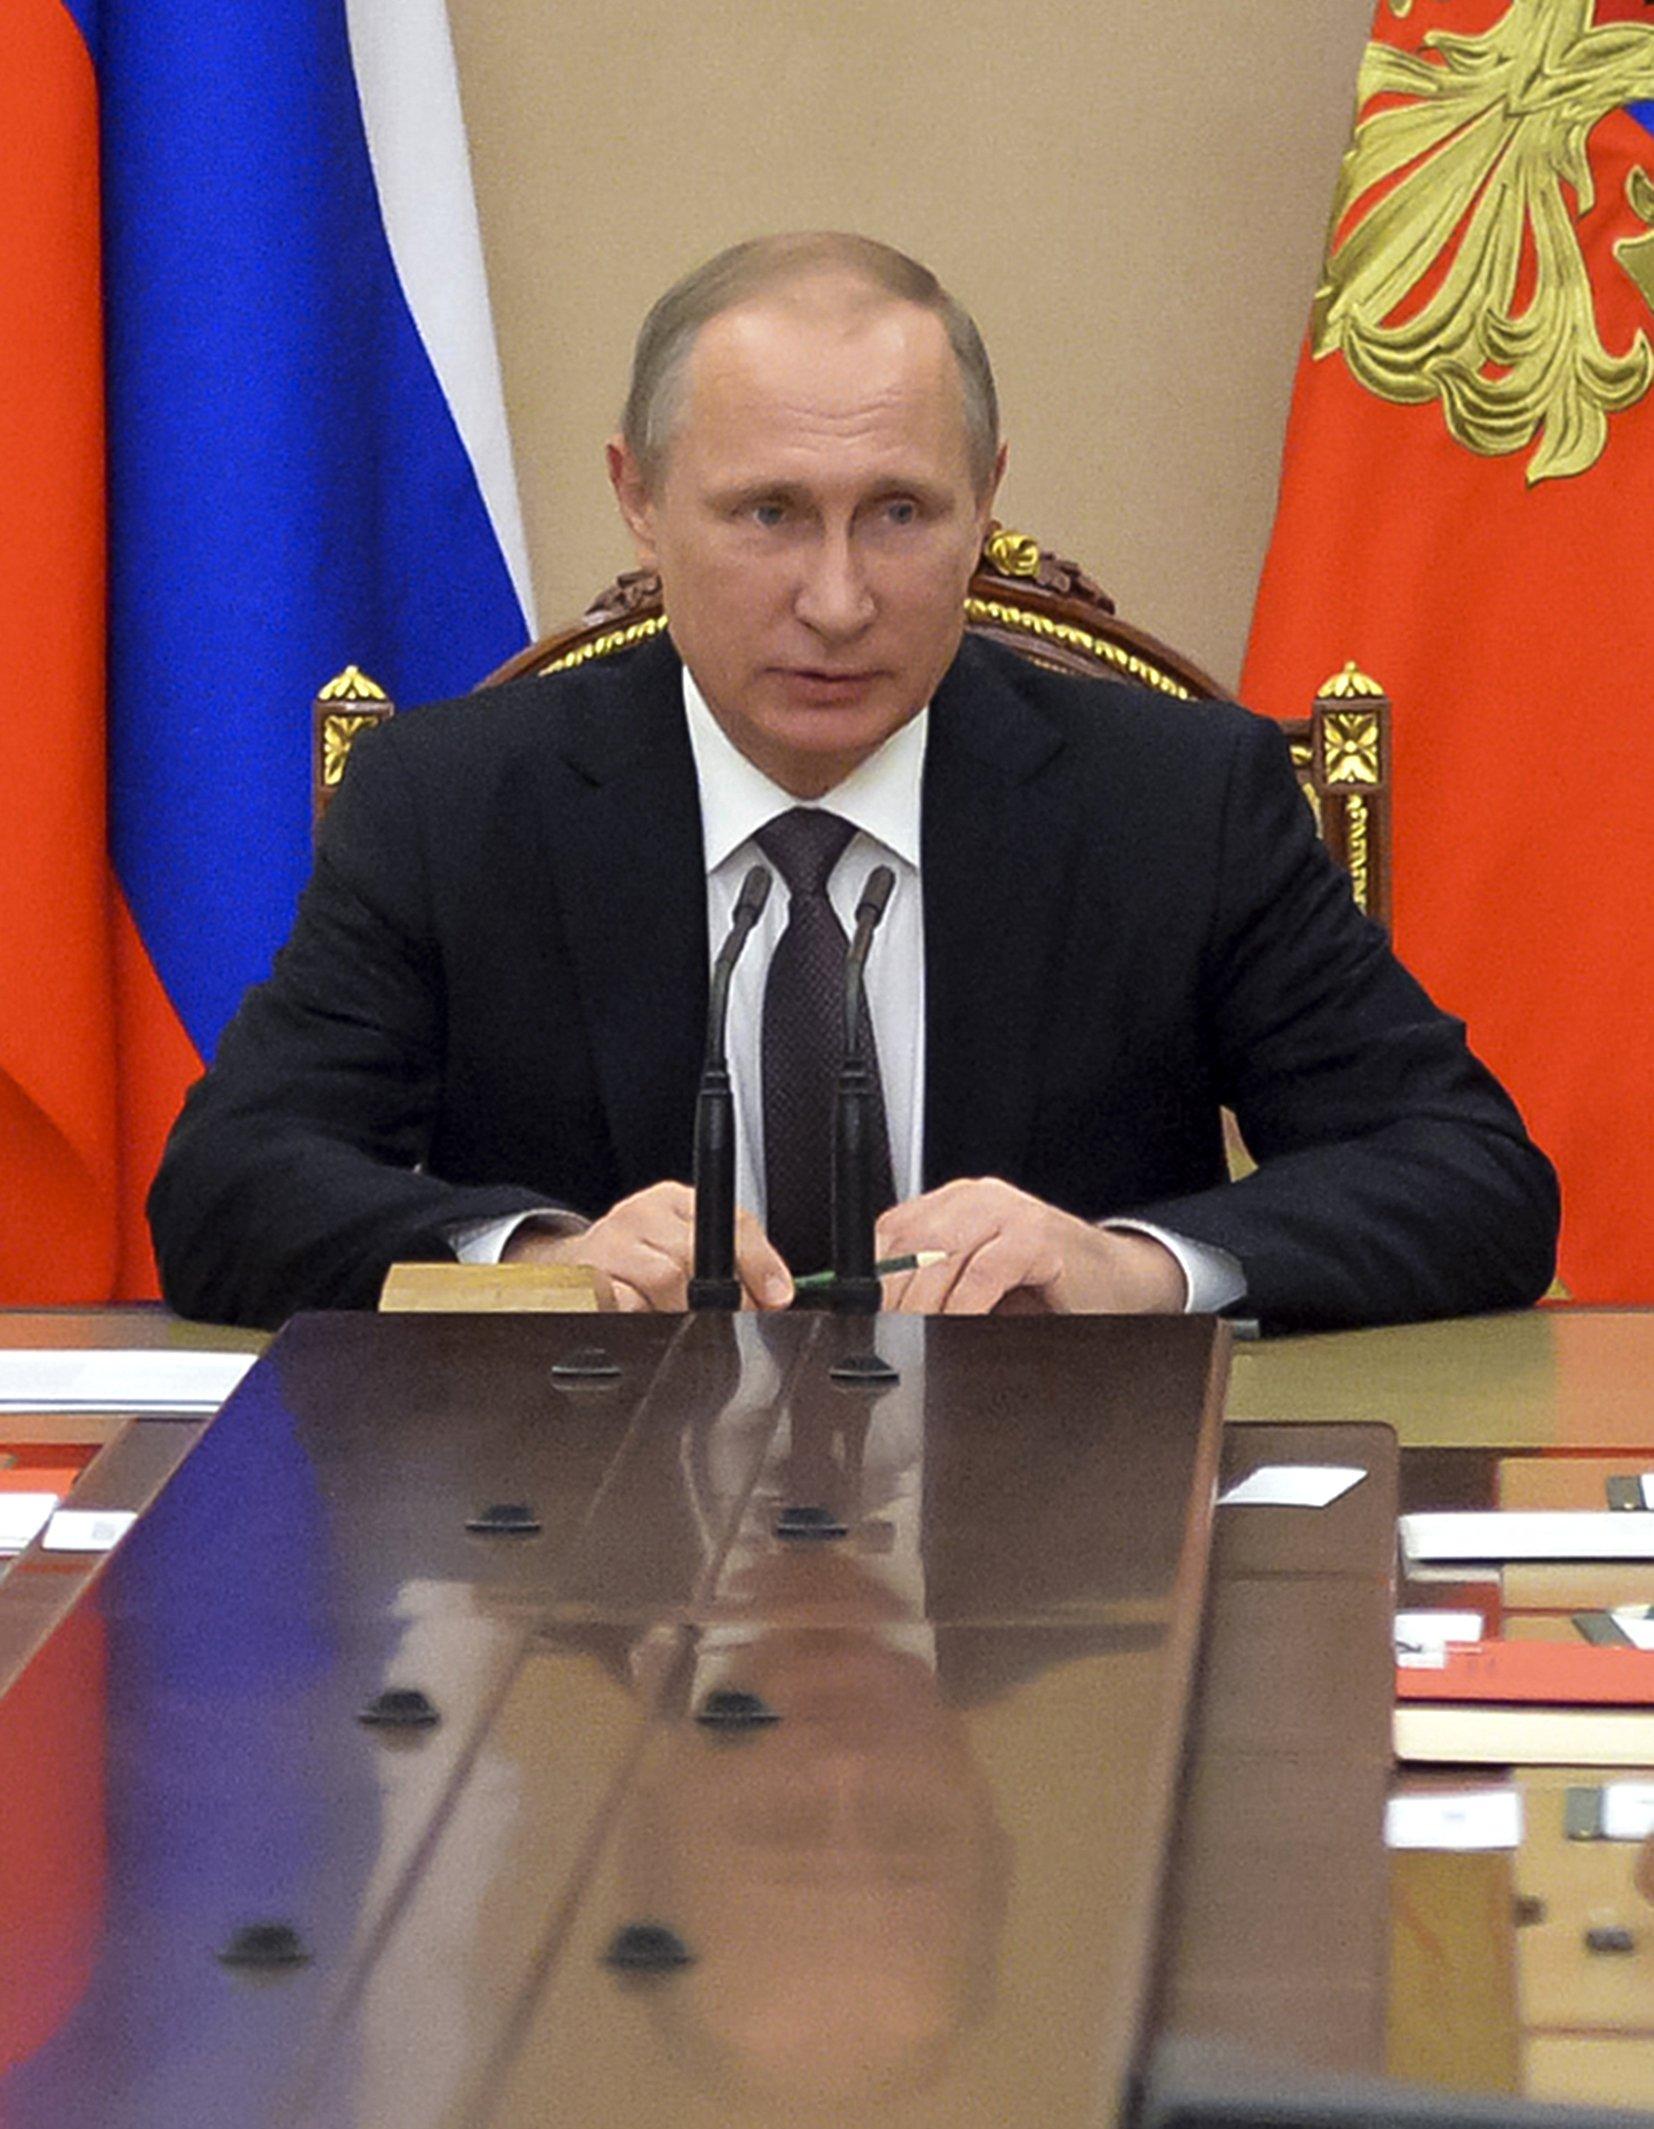 Tough talk between Russia, Ukraine heats up Crimea stalemate